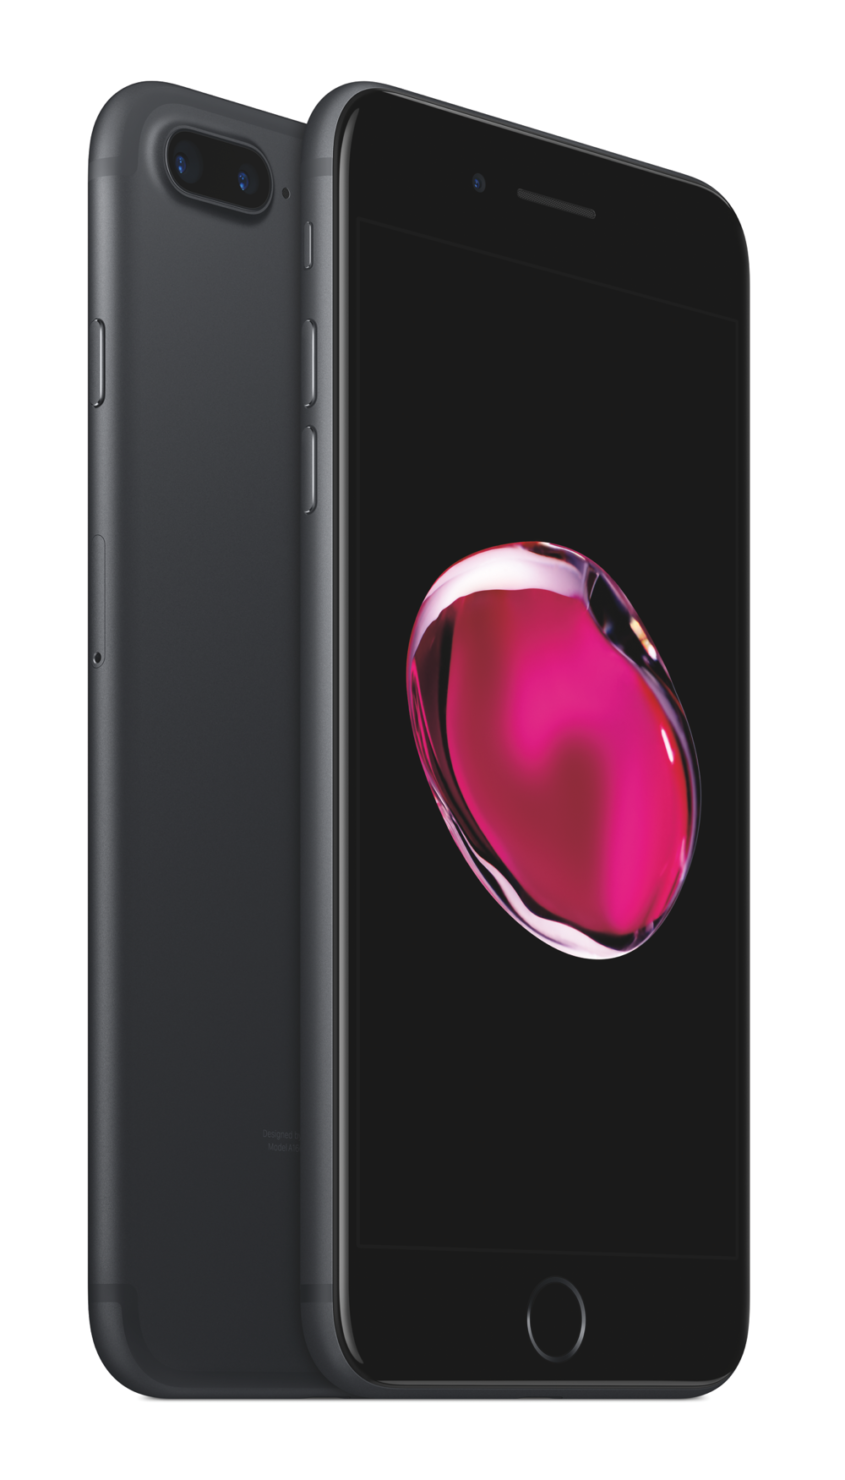 iphone-7-plus-pink